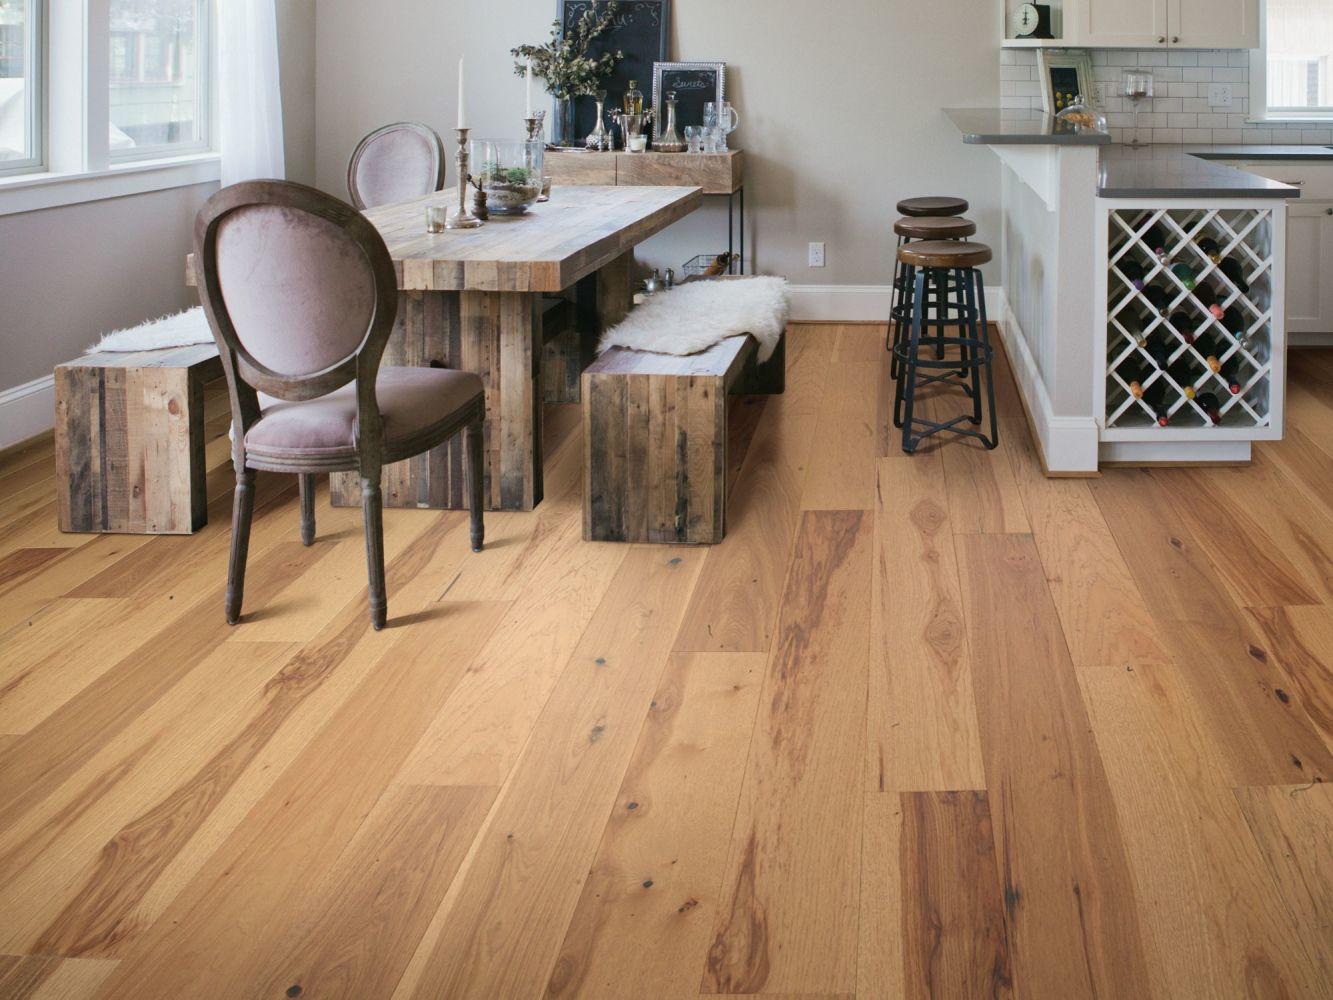 Shaw Floors Home Fn Gold Hardwood Oasis Hickory Repose 02060_HW715